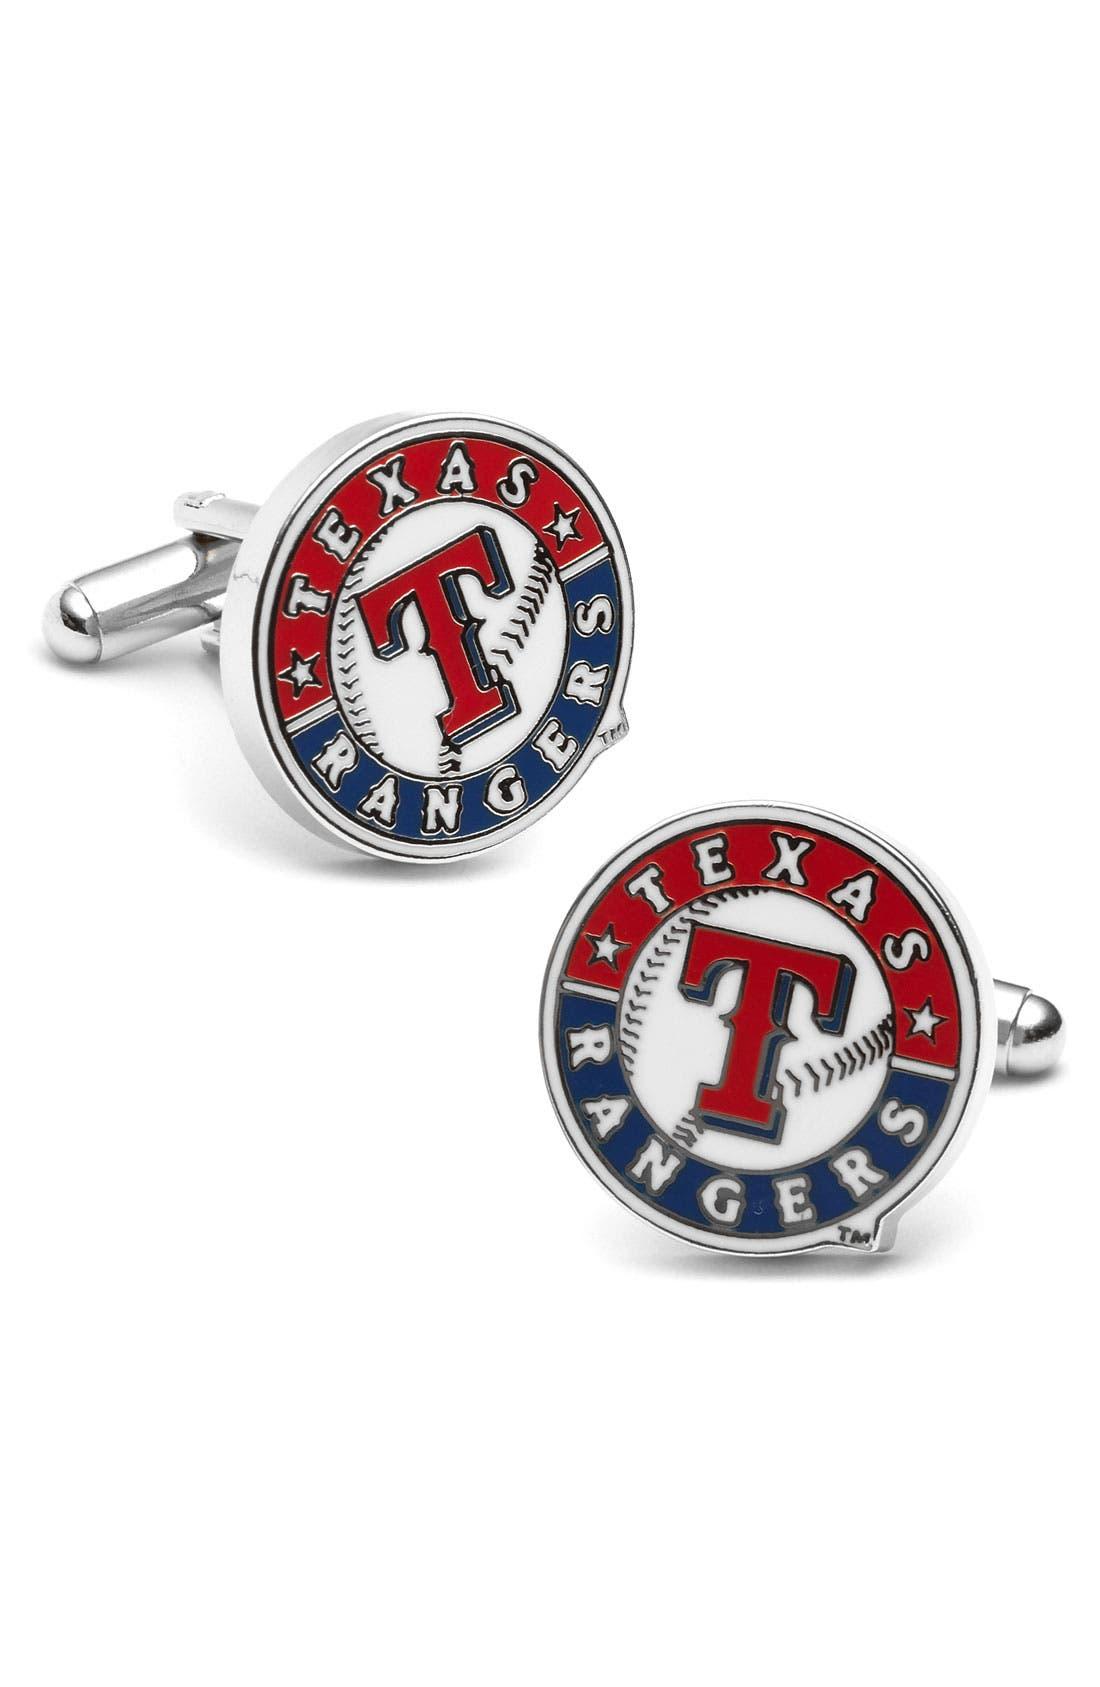 Cufflinks, Inc. 'Texas Rangers' Cuff Links